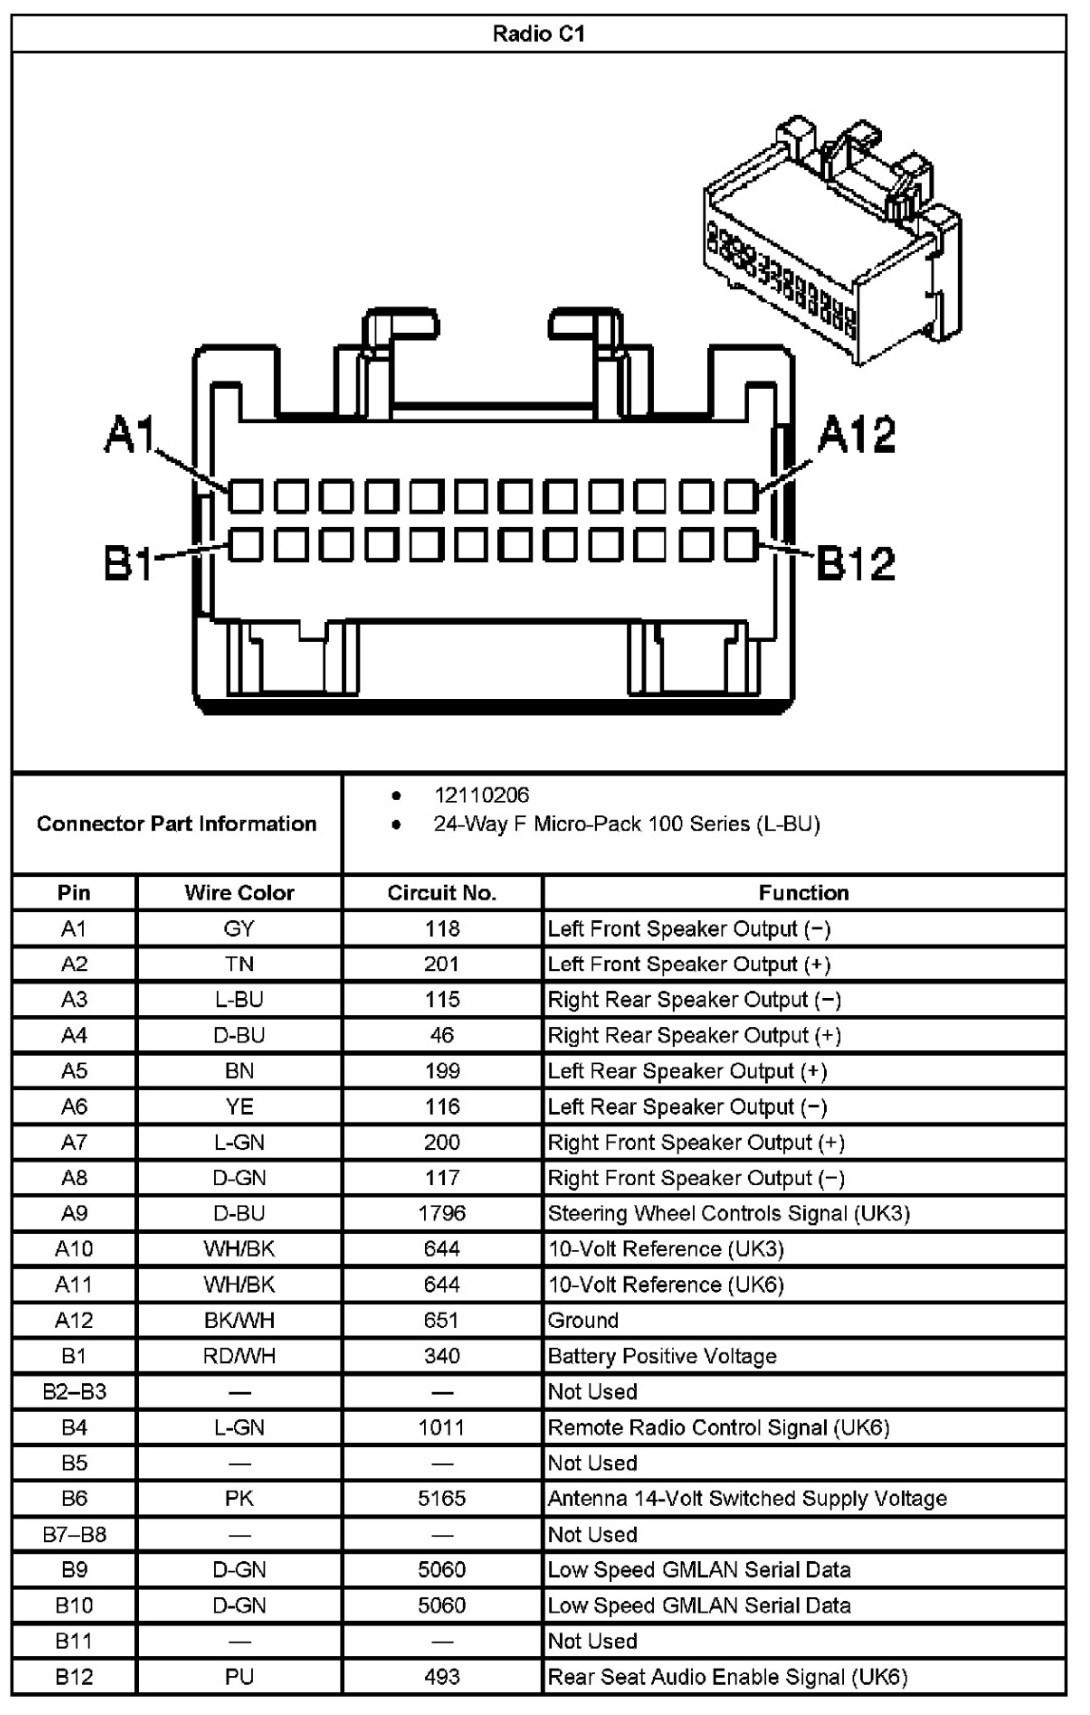 hight resolution of 2001 chevy silverado radio wiring diagram wirings diagram dodge wiring harness diagram 2003 tahoe radio wiring